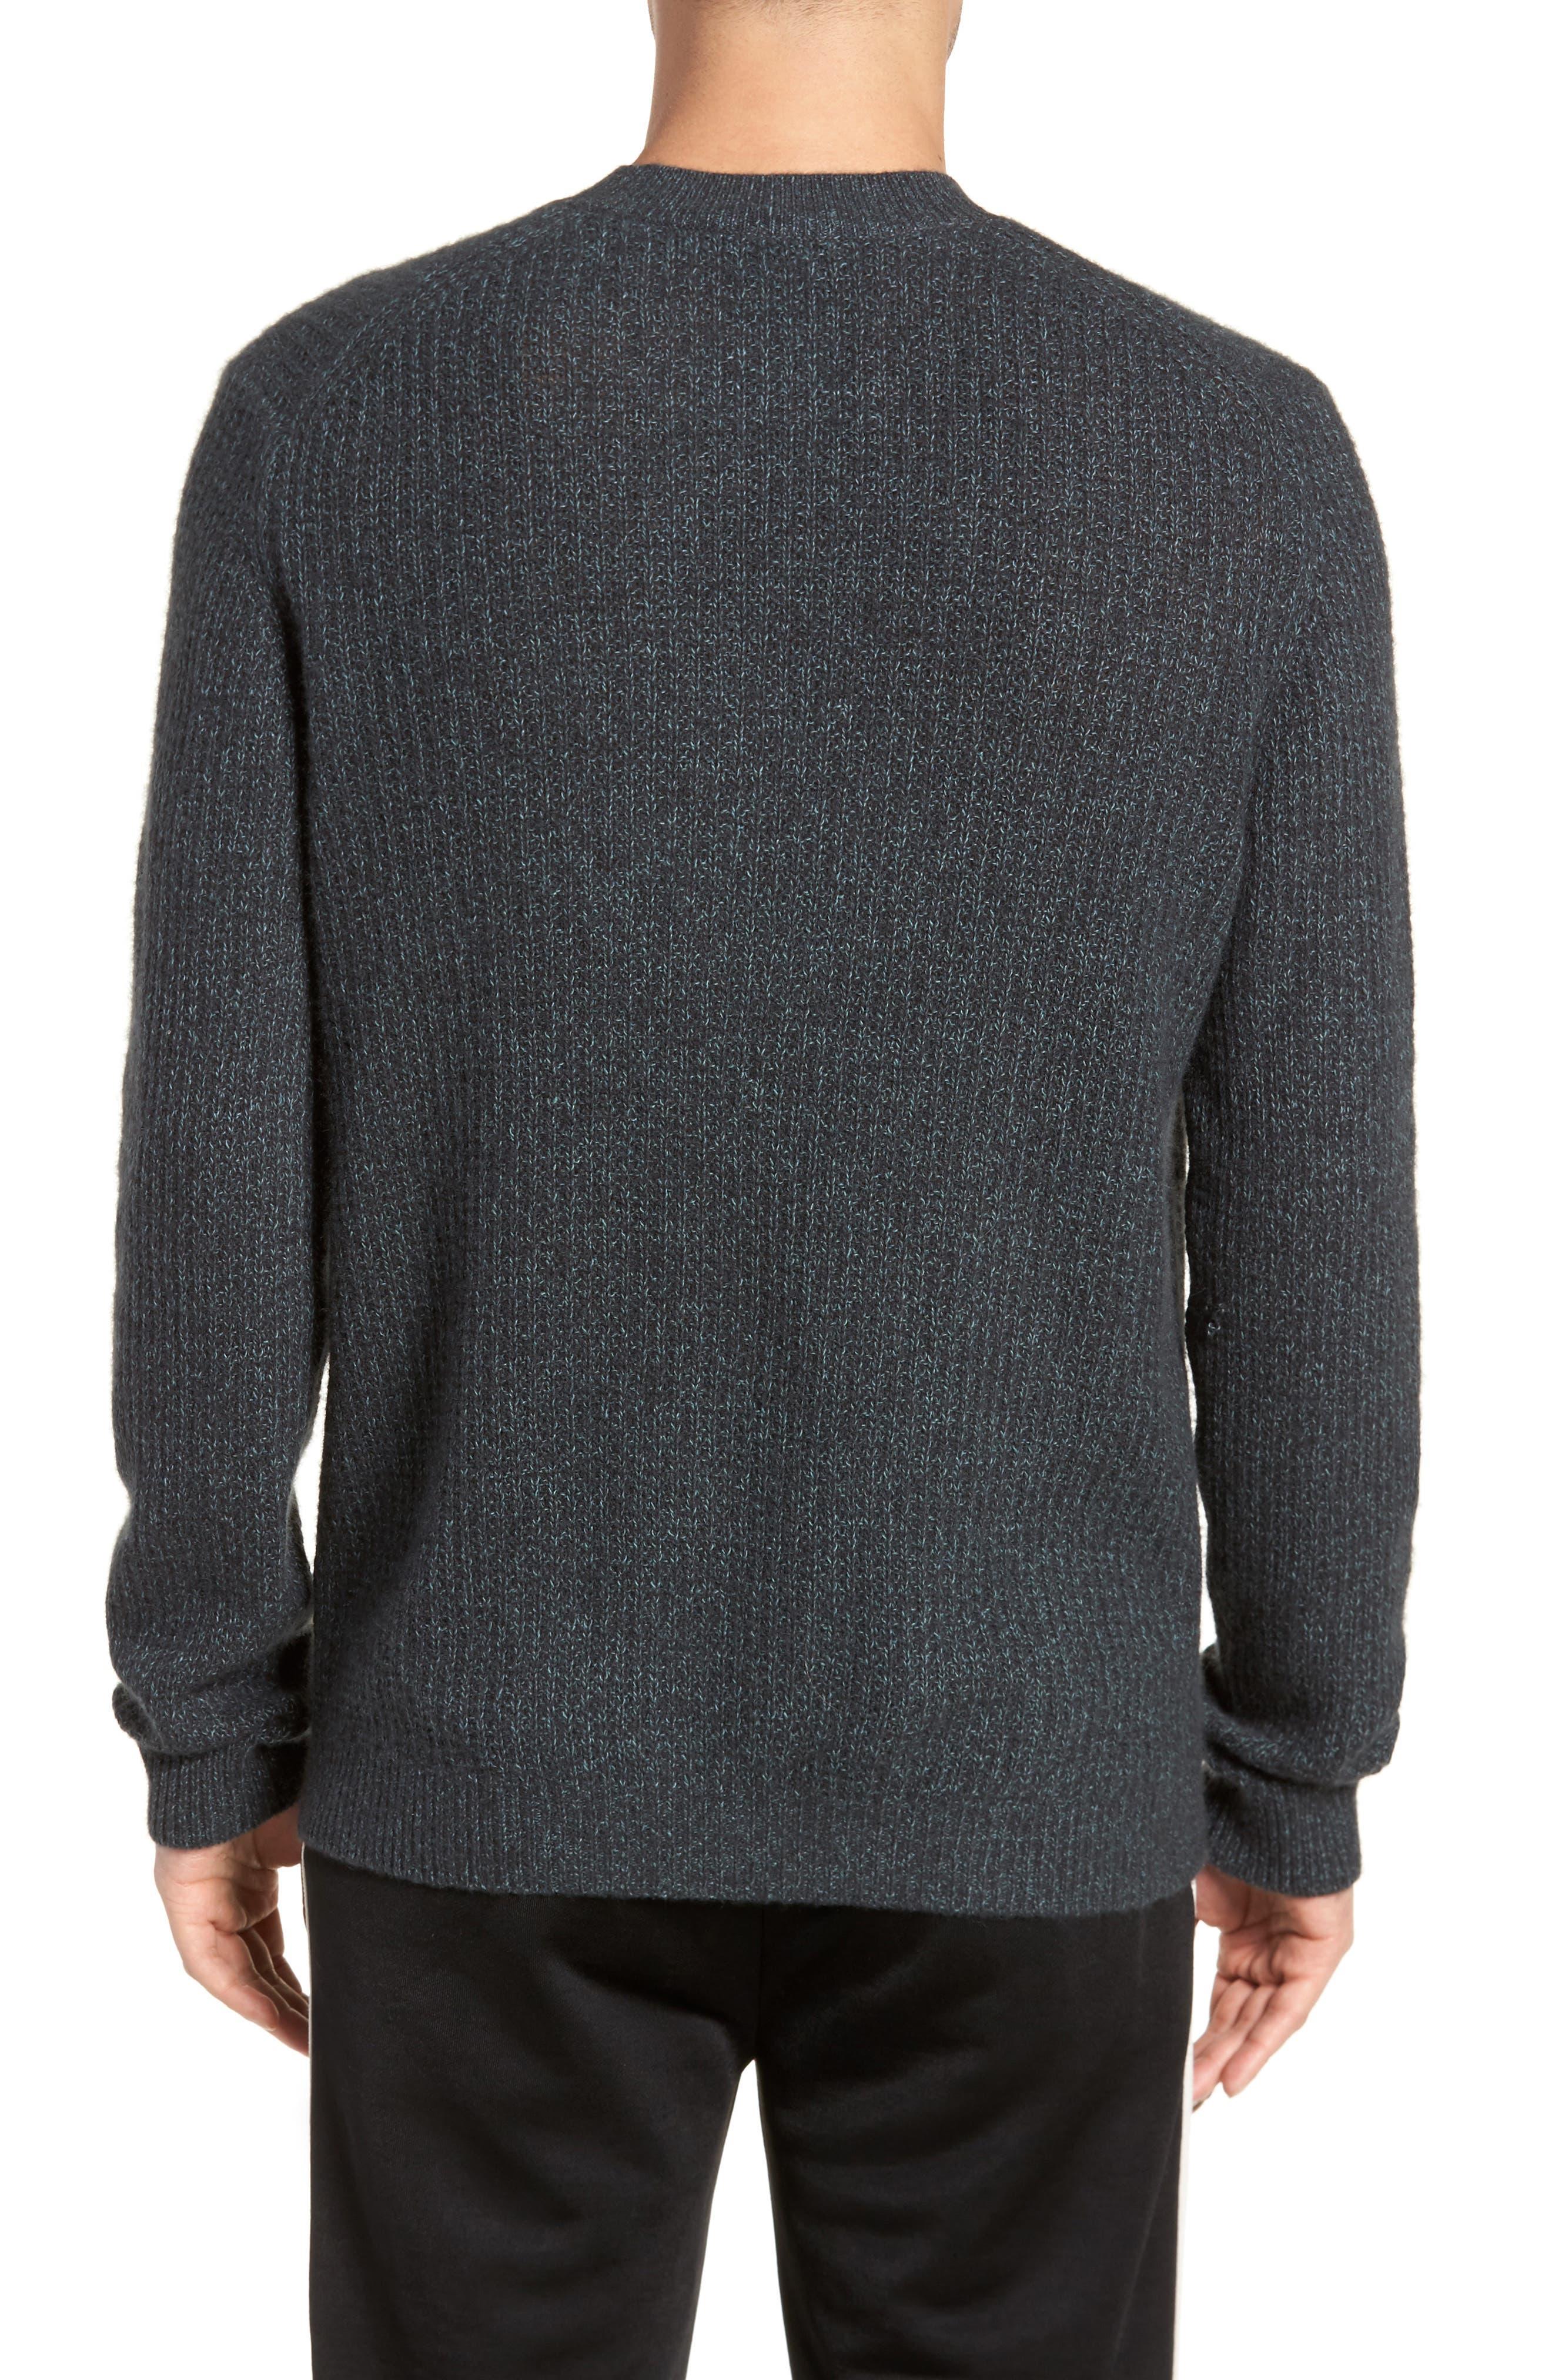 Thermal Knit Crewneck Cashmere Sweater,                             Alternate thumbnail 2, color,                             Beetle/ Mint